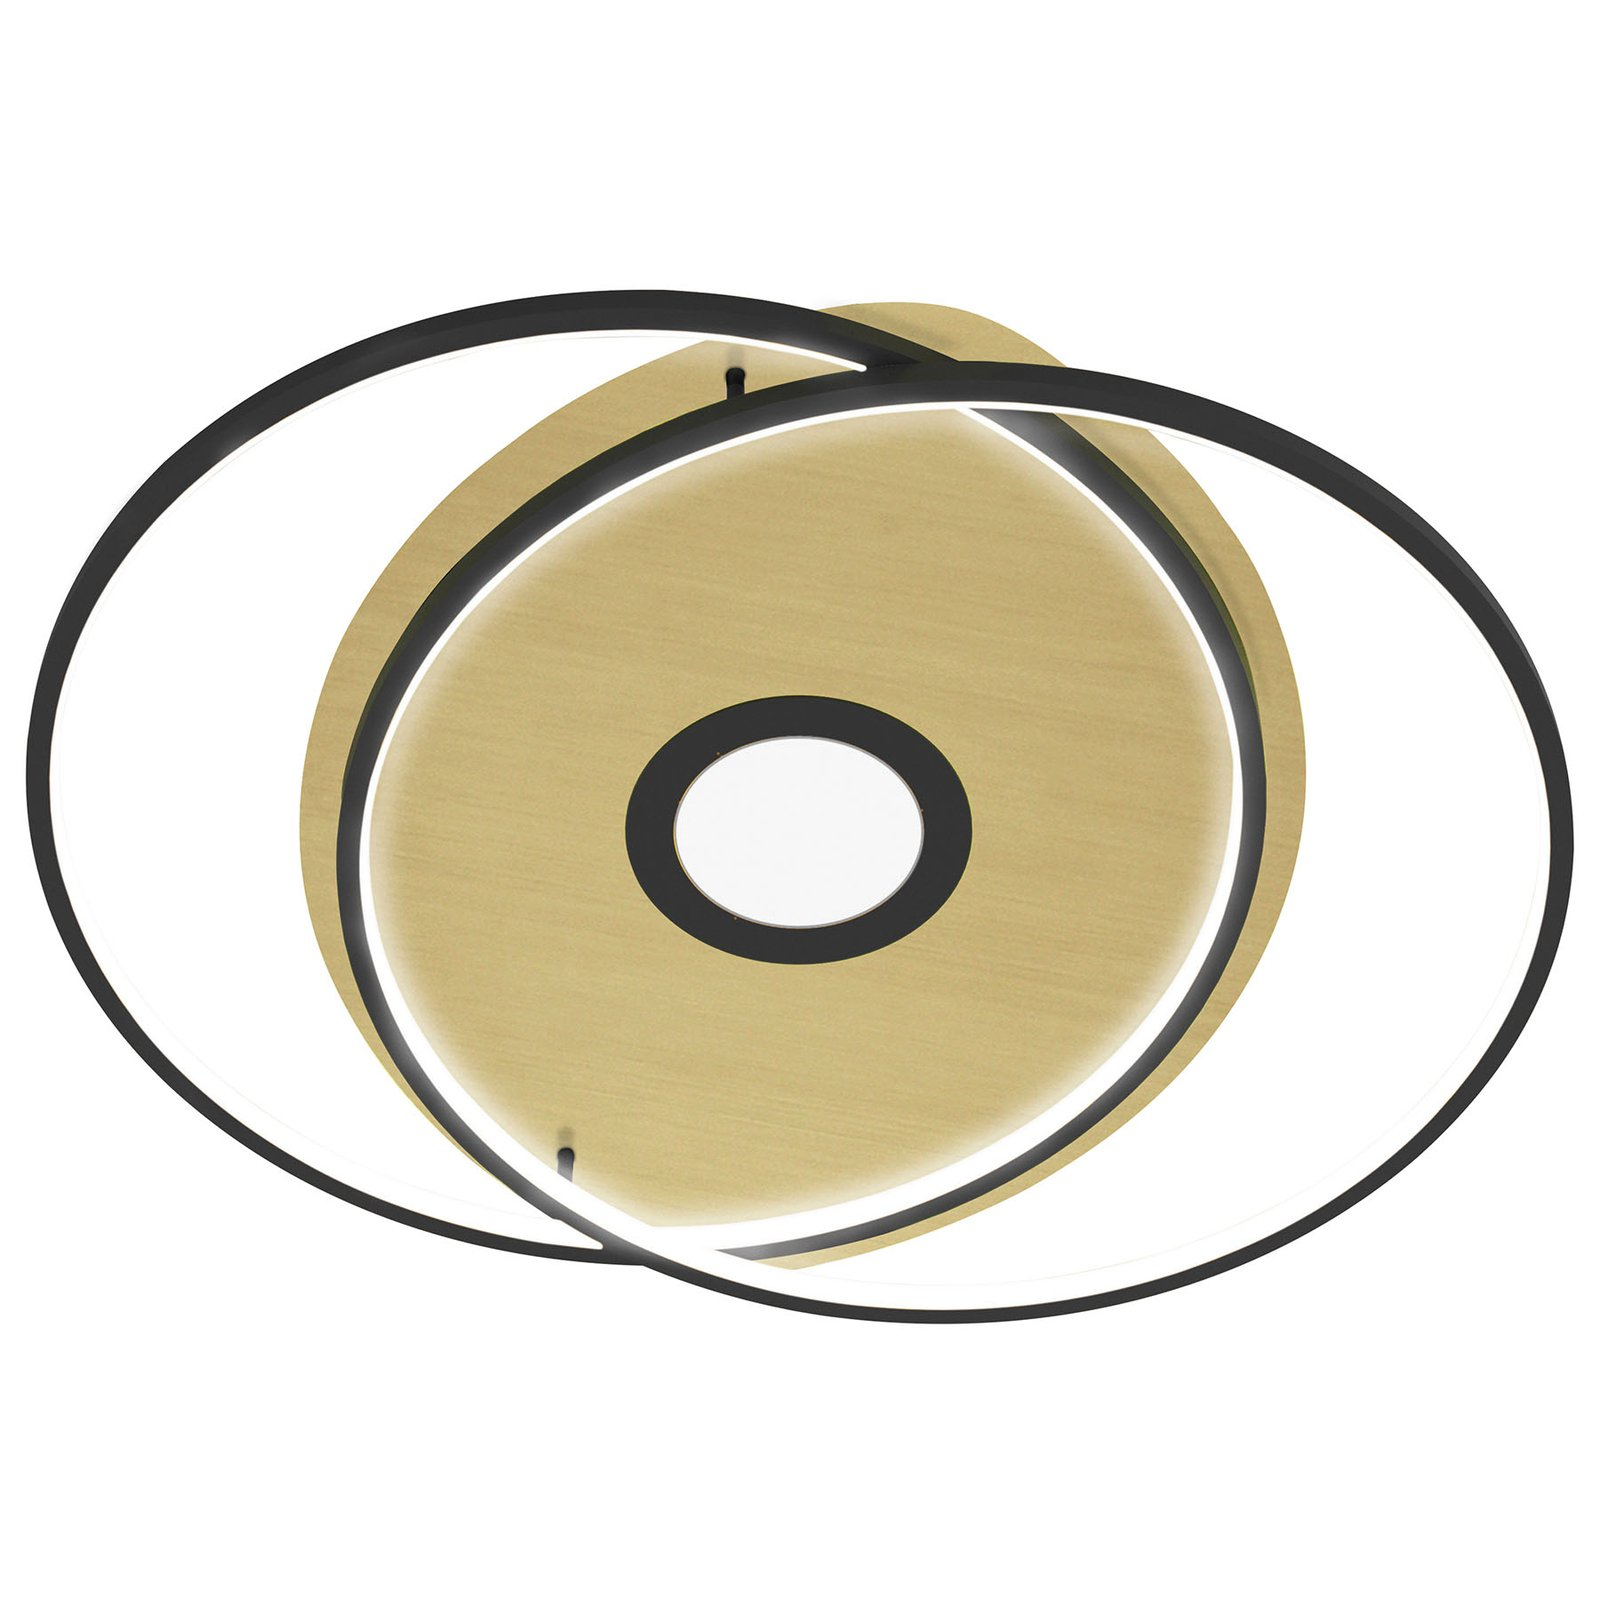 Paul Neuhaus Q-AMIRA LED-taklampe oval, svart